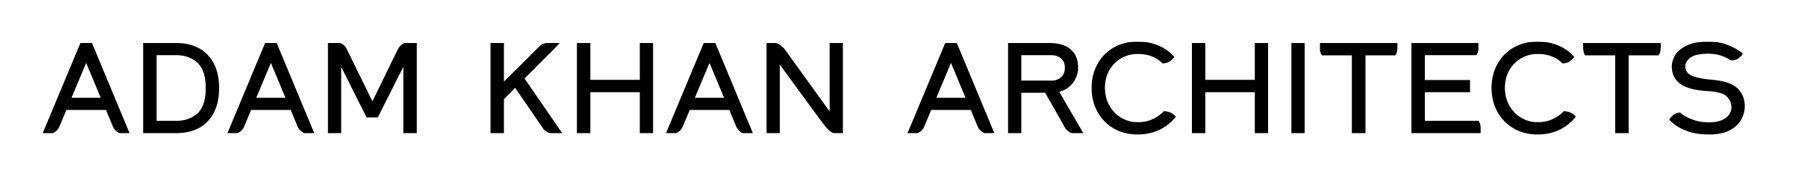 ADK_logo_black.width-2000.jpg